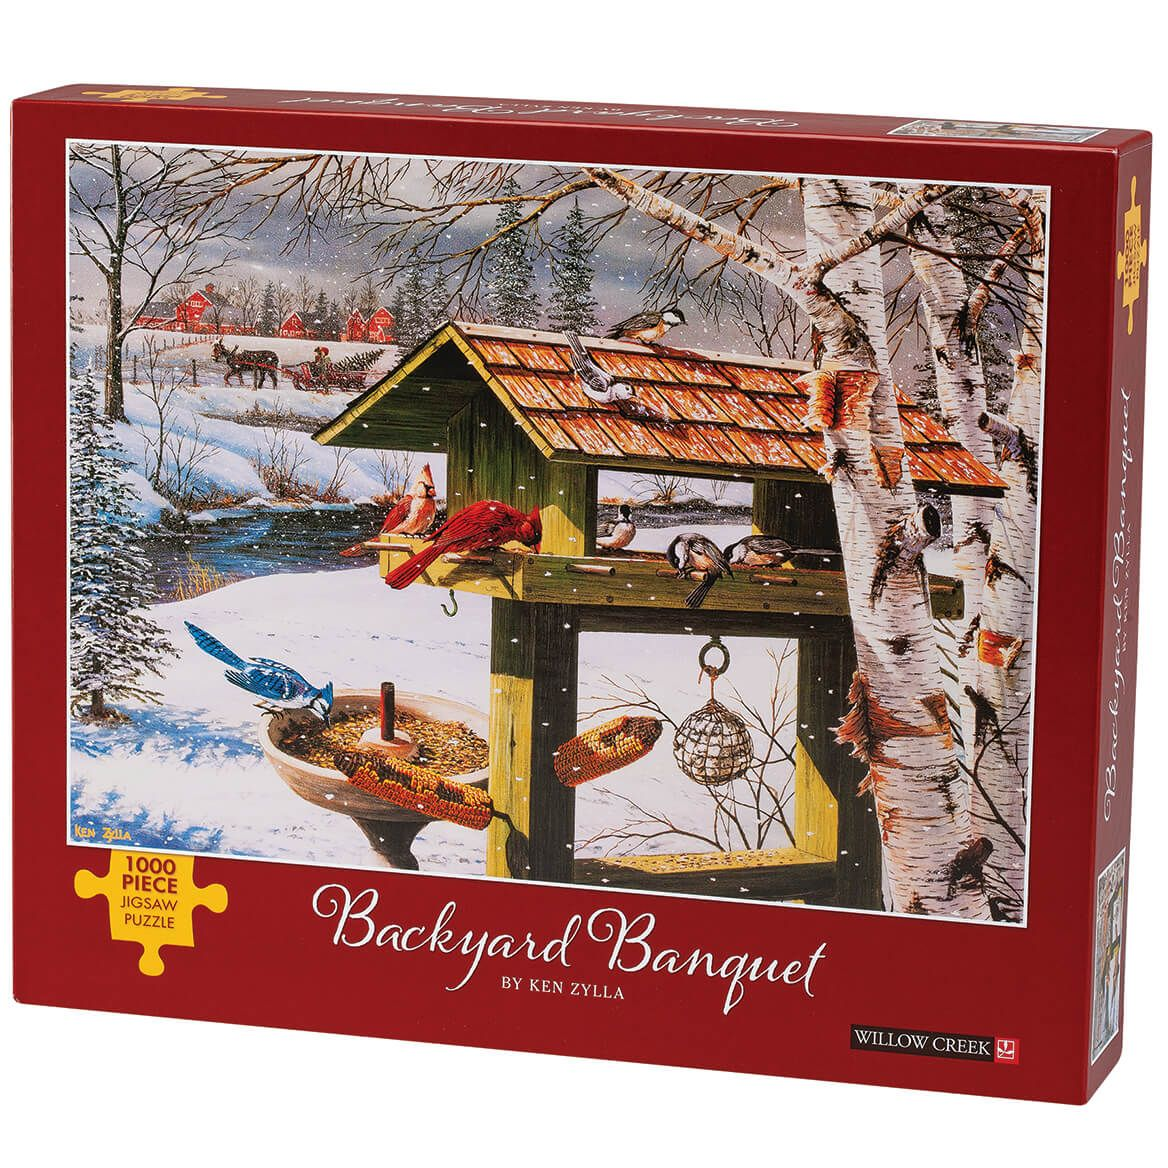 Backyard Banquet Jigsaw Puzzle, 1000 Pieces-371981